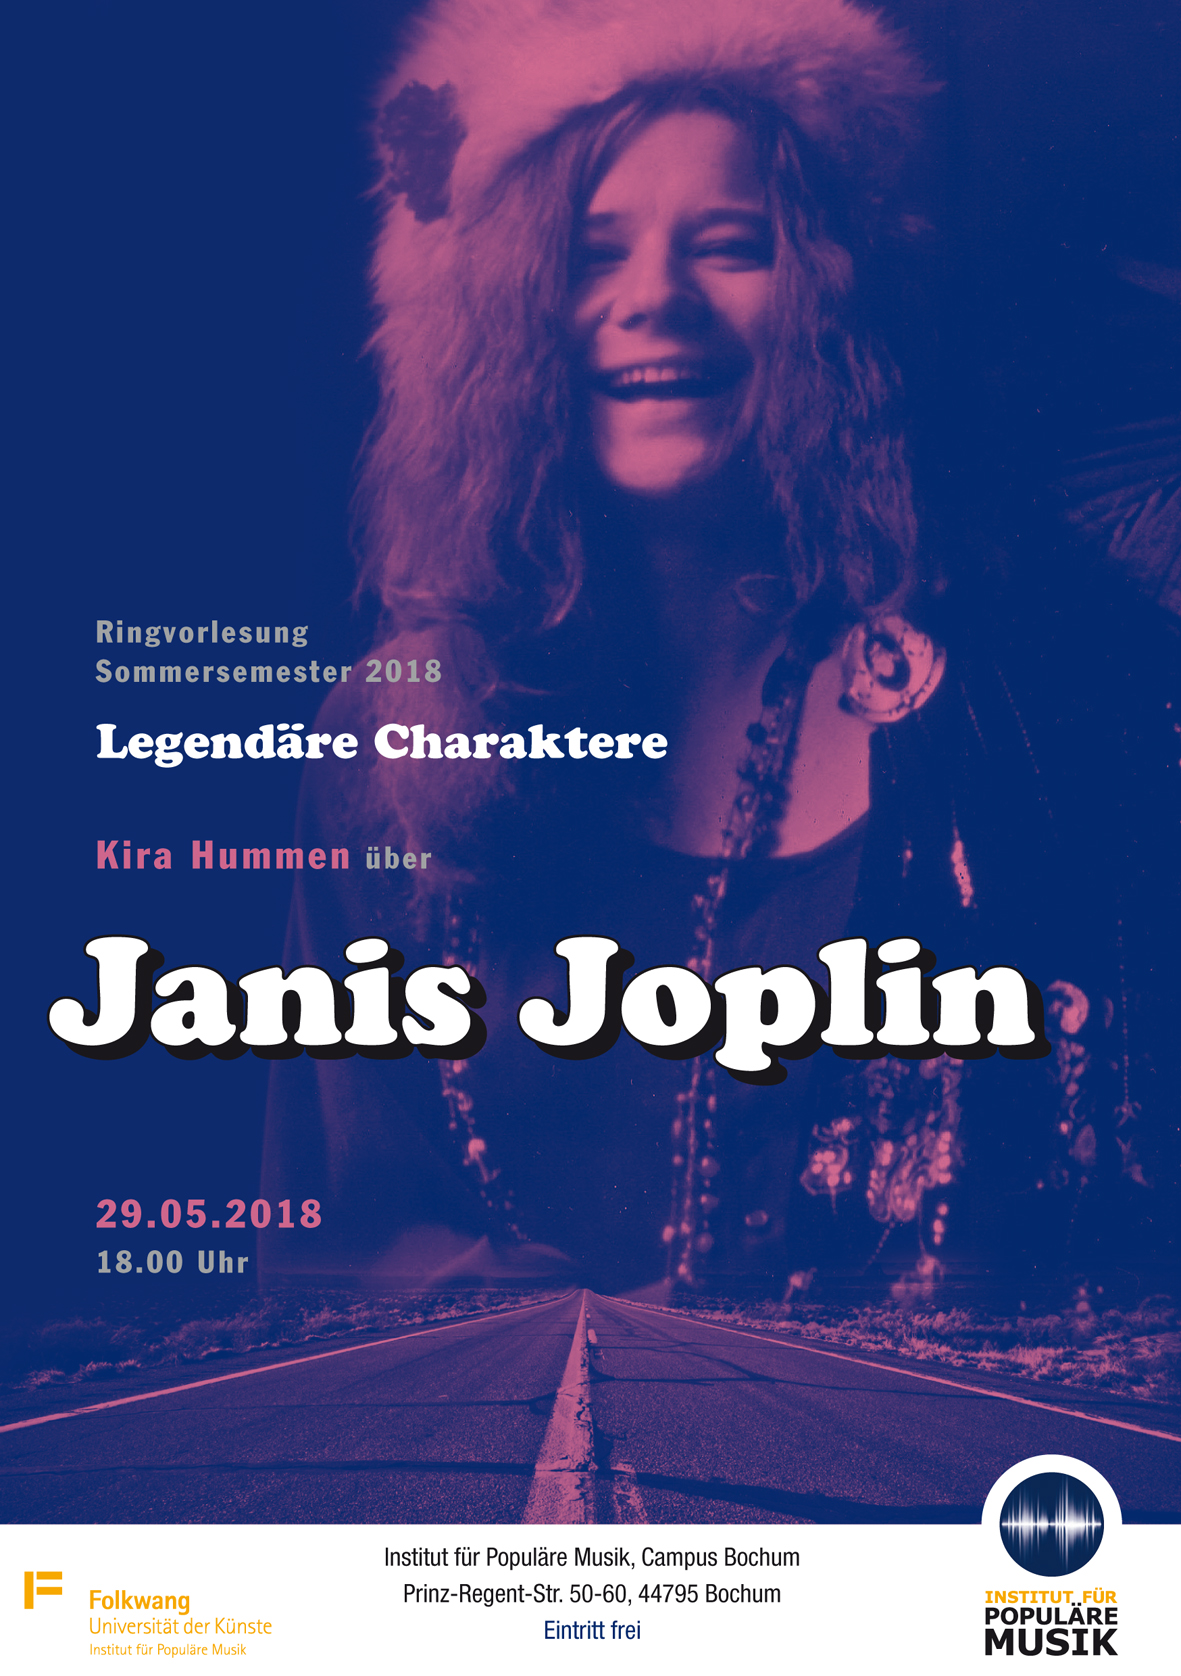 Kira Hummen über Janis Joplin